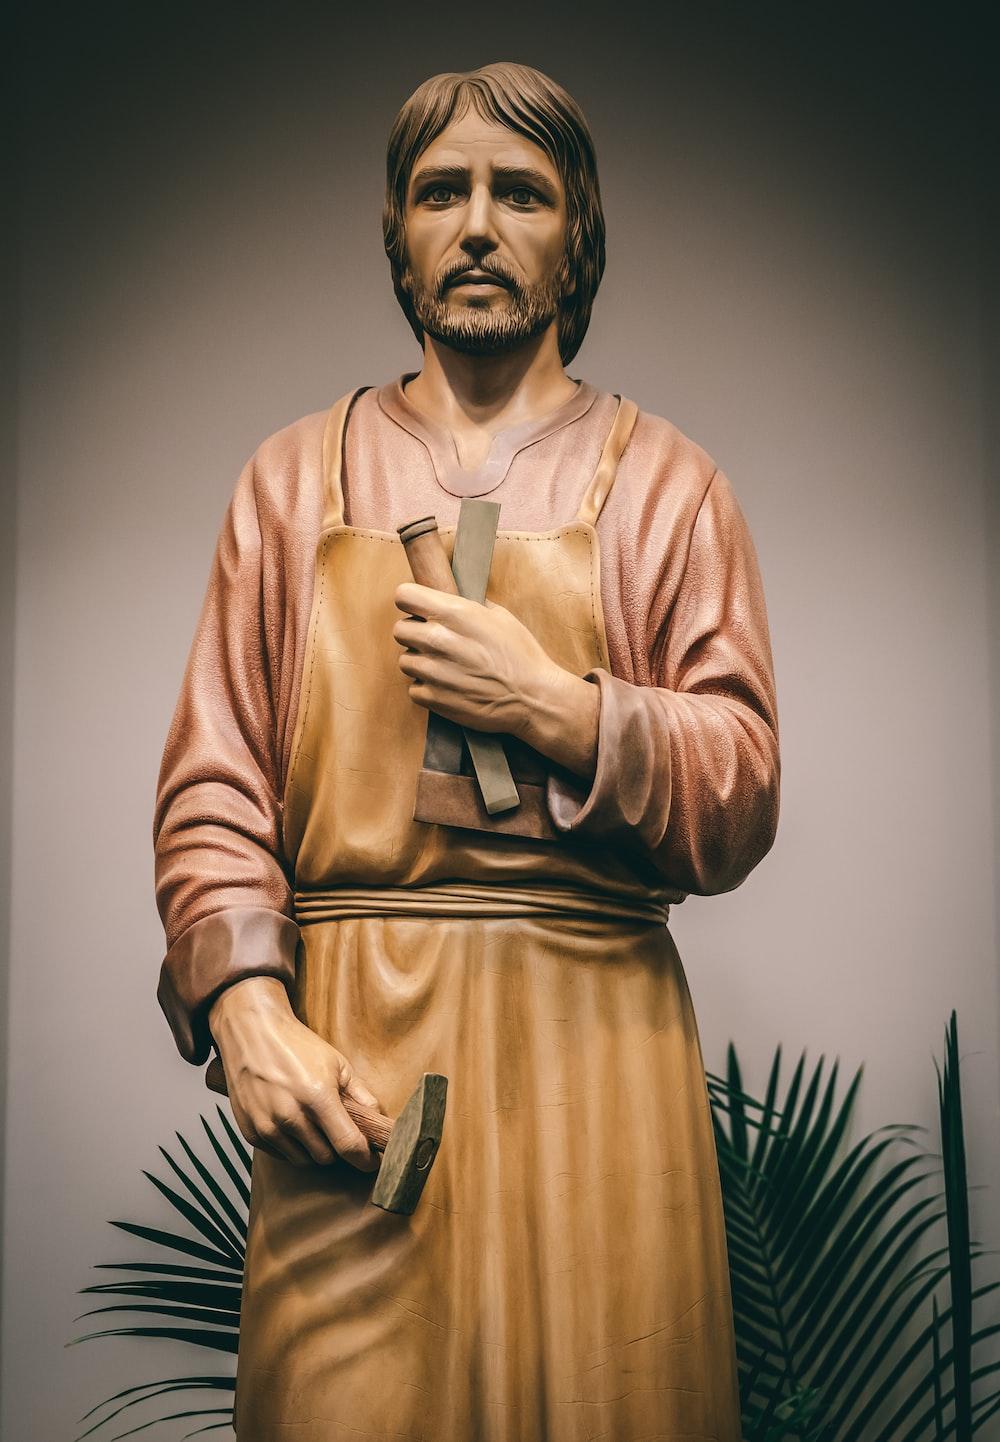 man holding hammer statue